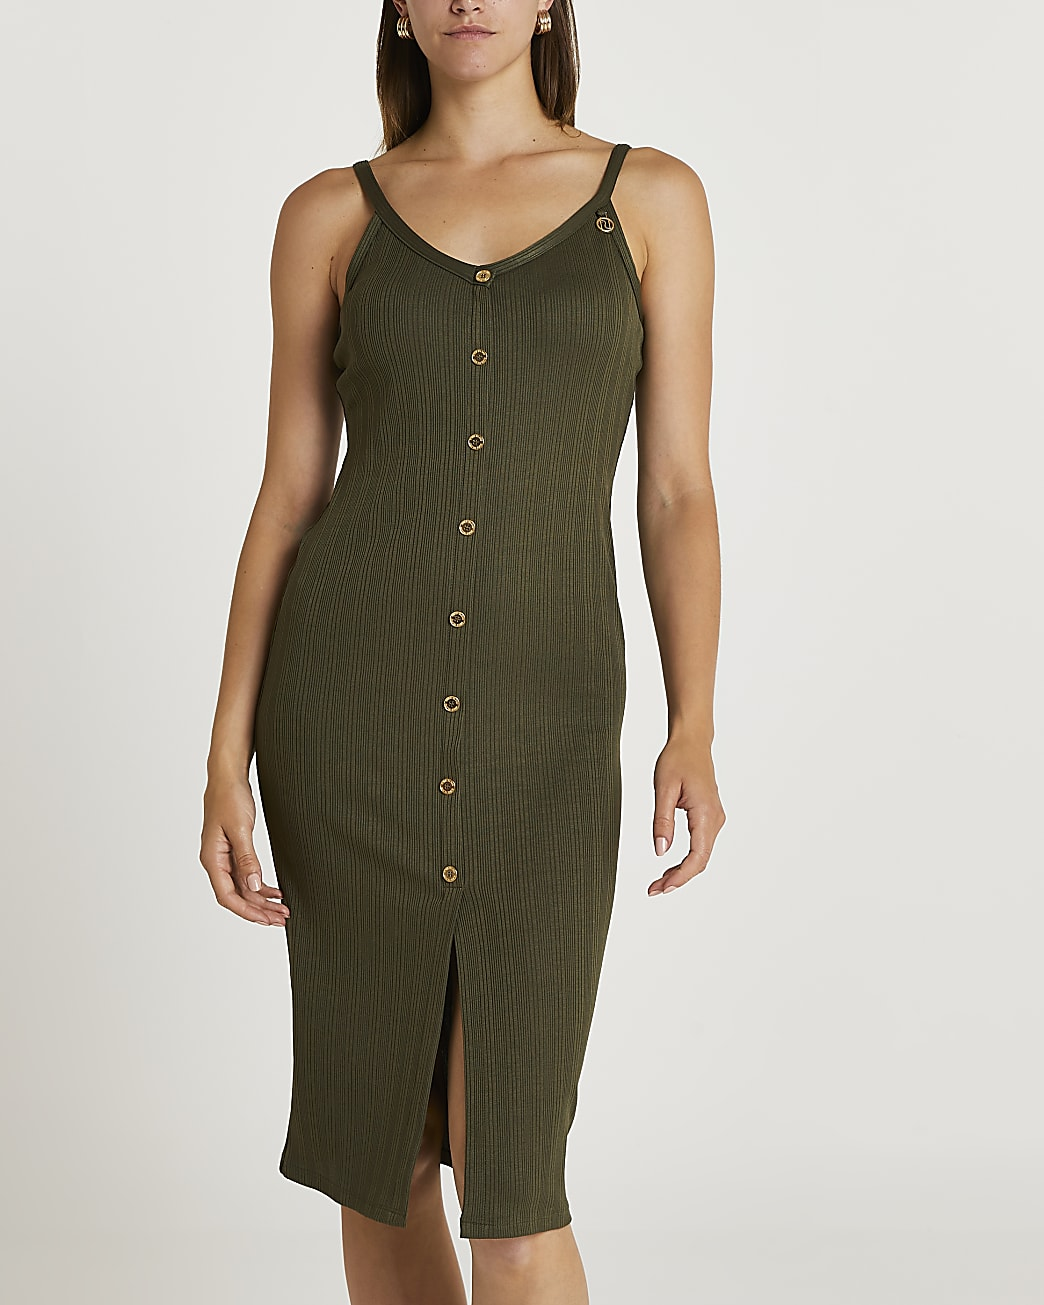 Khaki ribbed button front midi dress